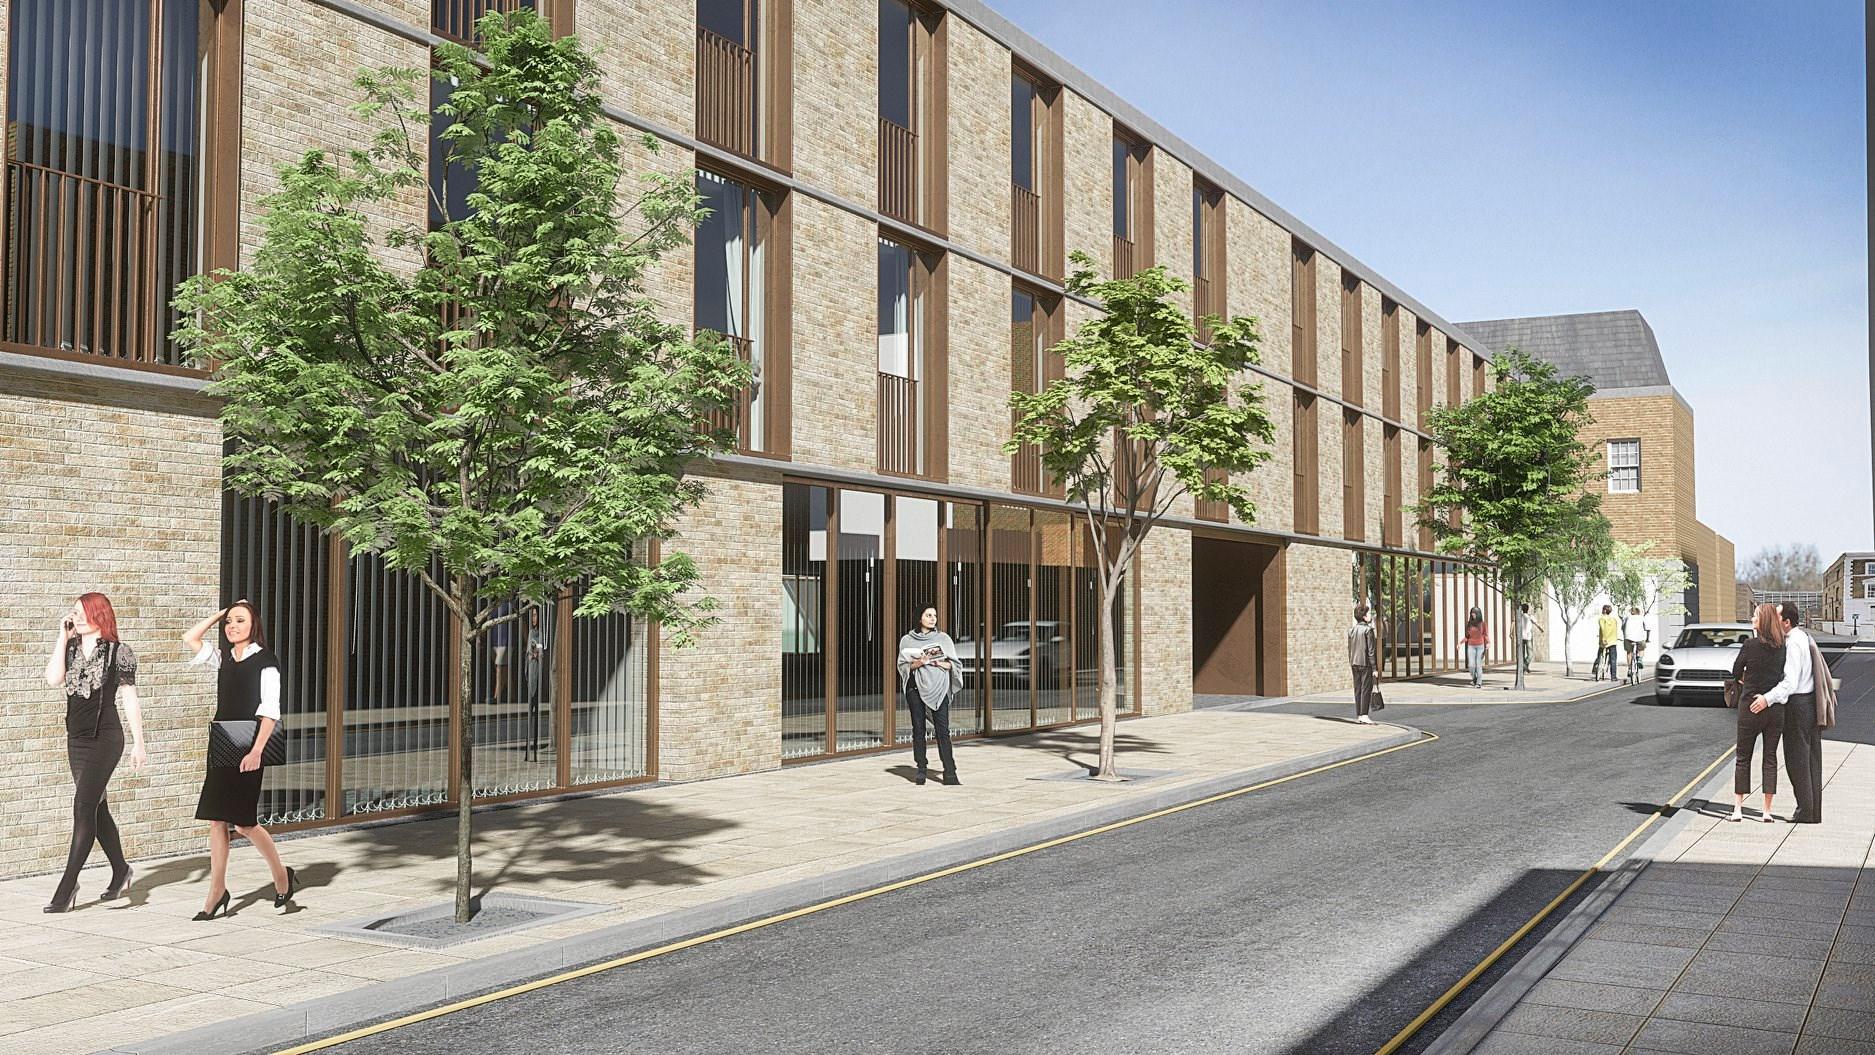 Melt Homes Project at 68-86 Clapham Road, Kennington - Rear CGI